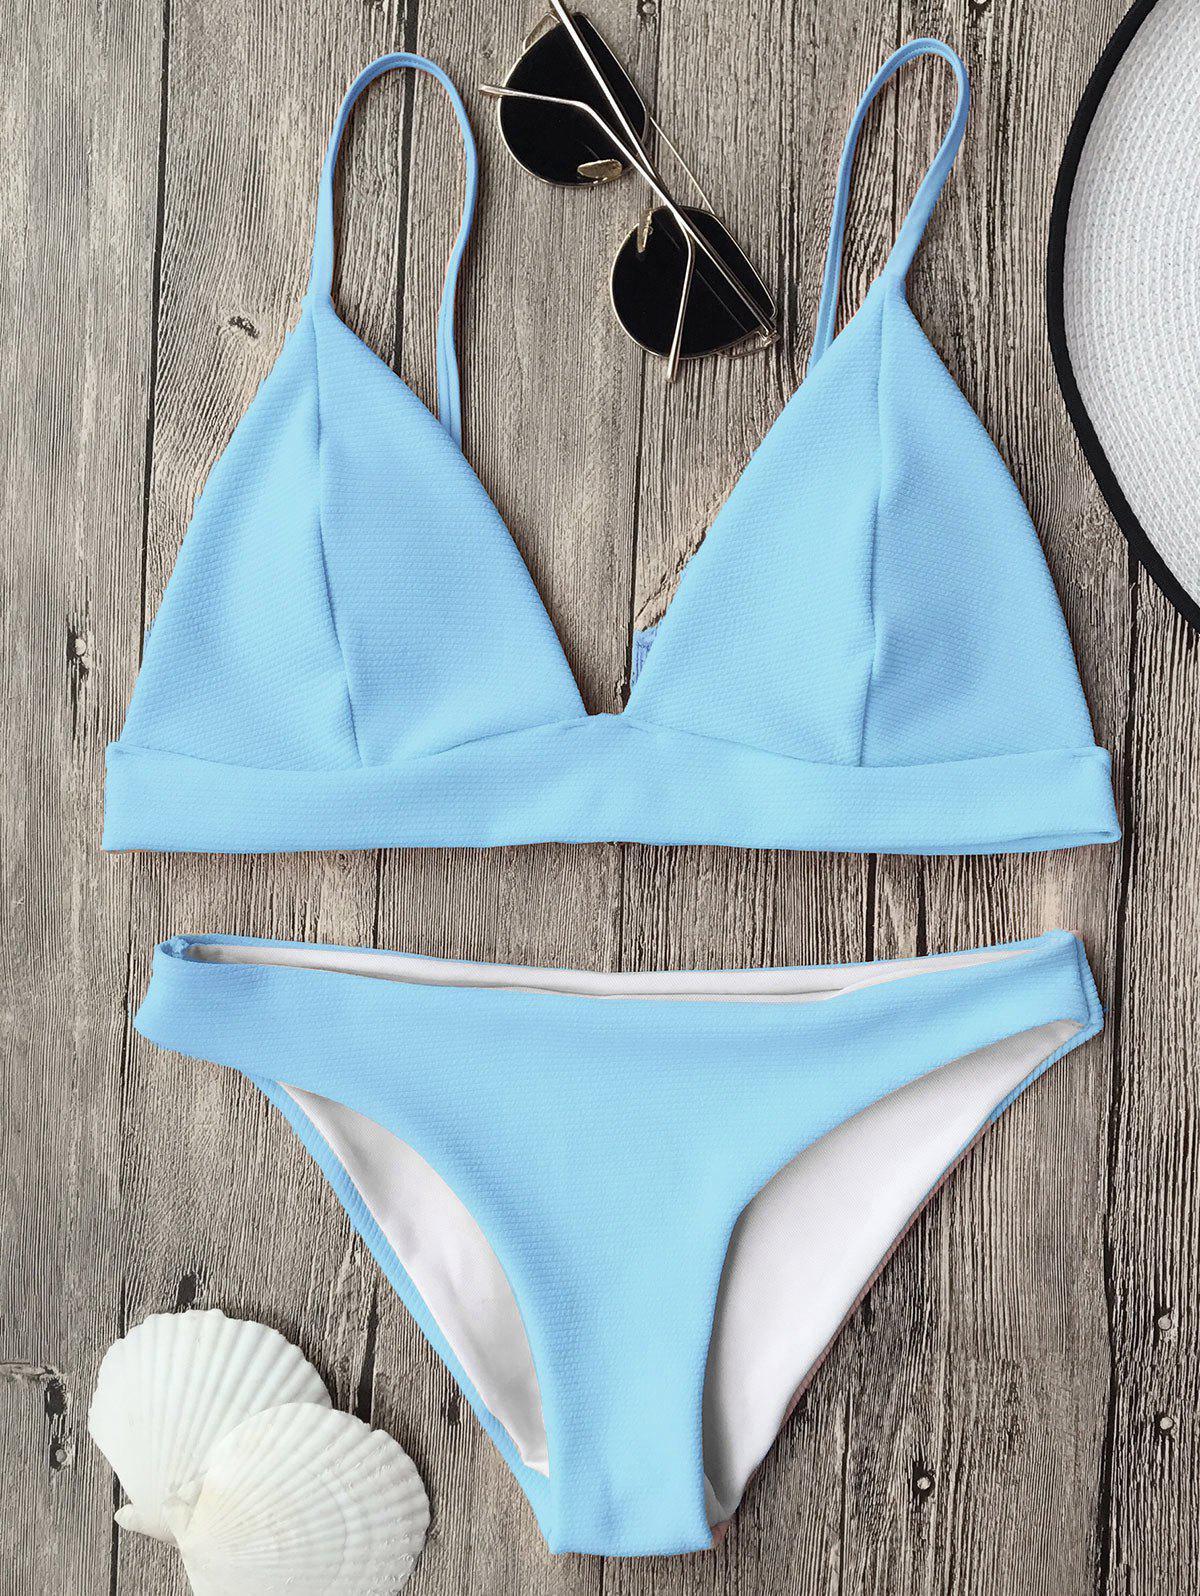 Cami Plunge Bralette Bikini Top and Bottoms